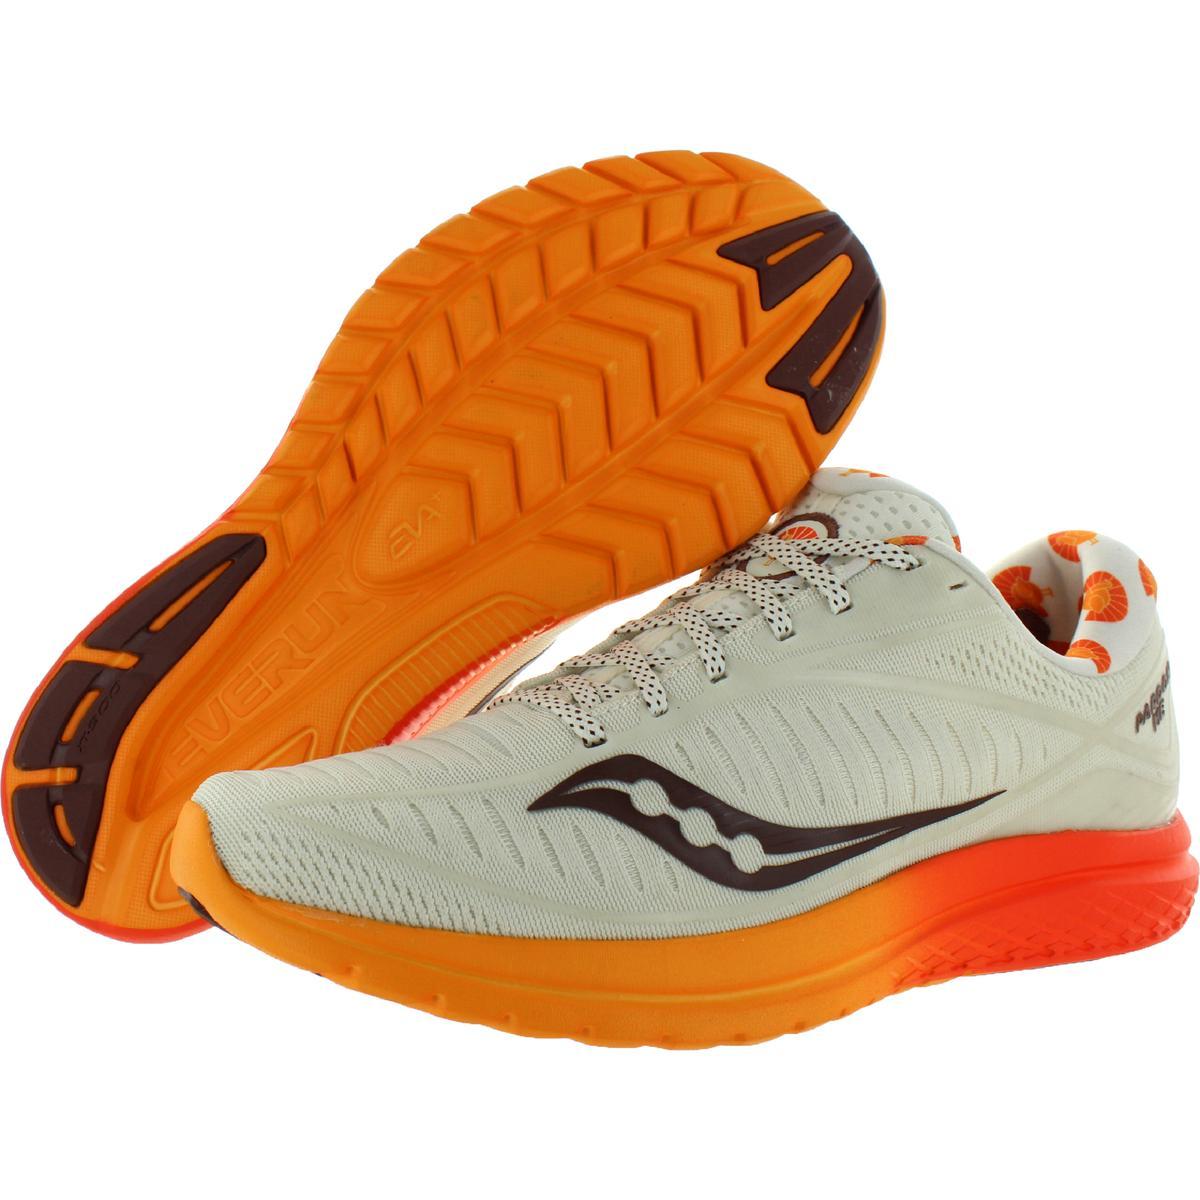 Saucony-Herren-Kinvara-10-Comfort-Running-Turnschuhe-Sneakers-Schuhe-bhfo-3377 Indexbild 11